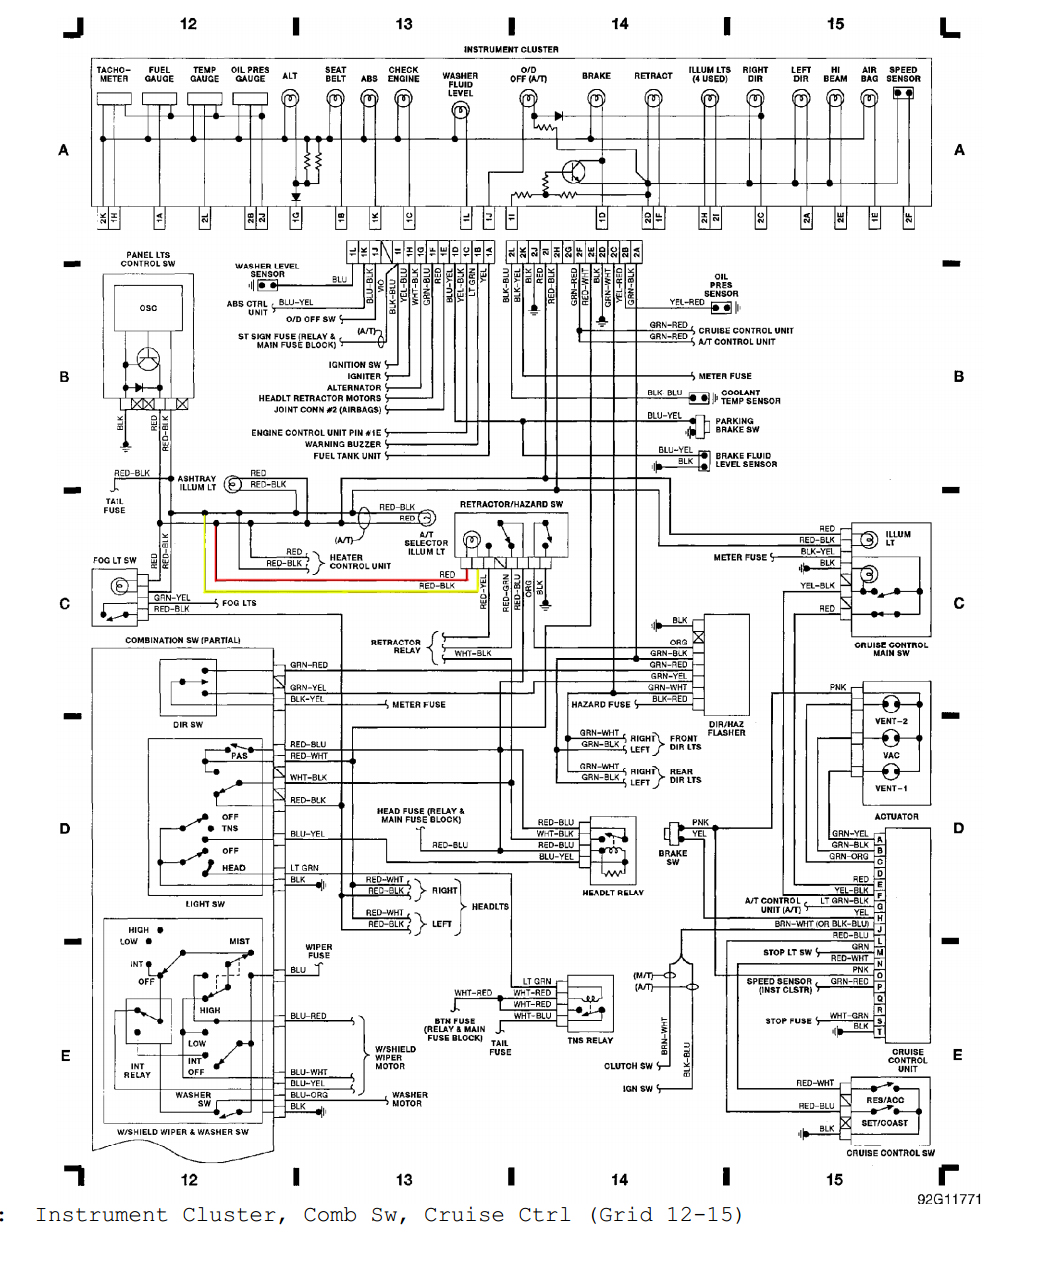 [SCHEMATICS_49CH]  SS_4293] Mazda B2200 Starter Diagram 1991 Mazda Miata 1989 Mazda B2200  Ignition Free Diagram | Mazda E2200 Wiring Diagram |  | Weveq Reda Nowa Hyedi Salv Mohammedshrine Librar Wiring 101